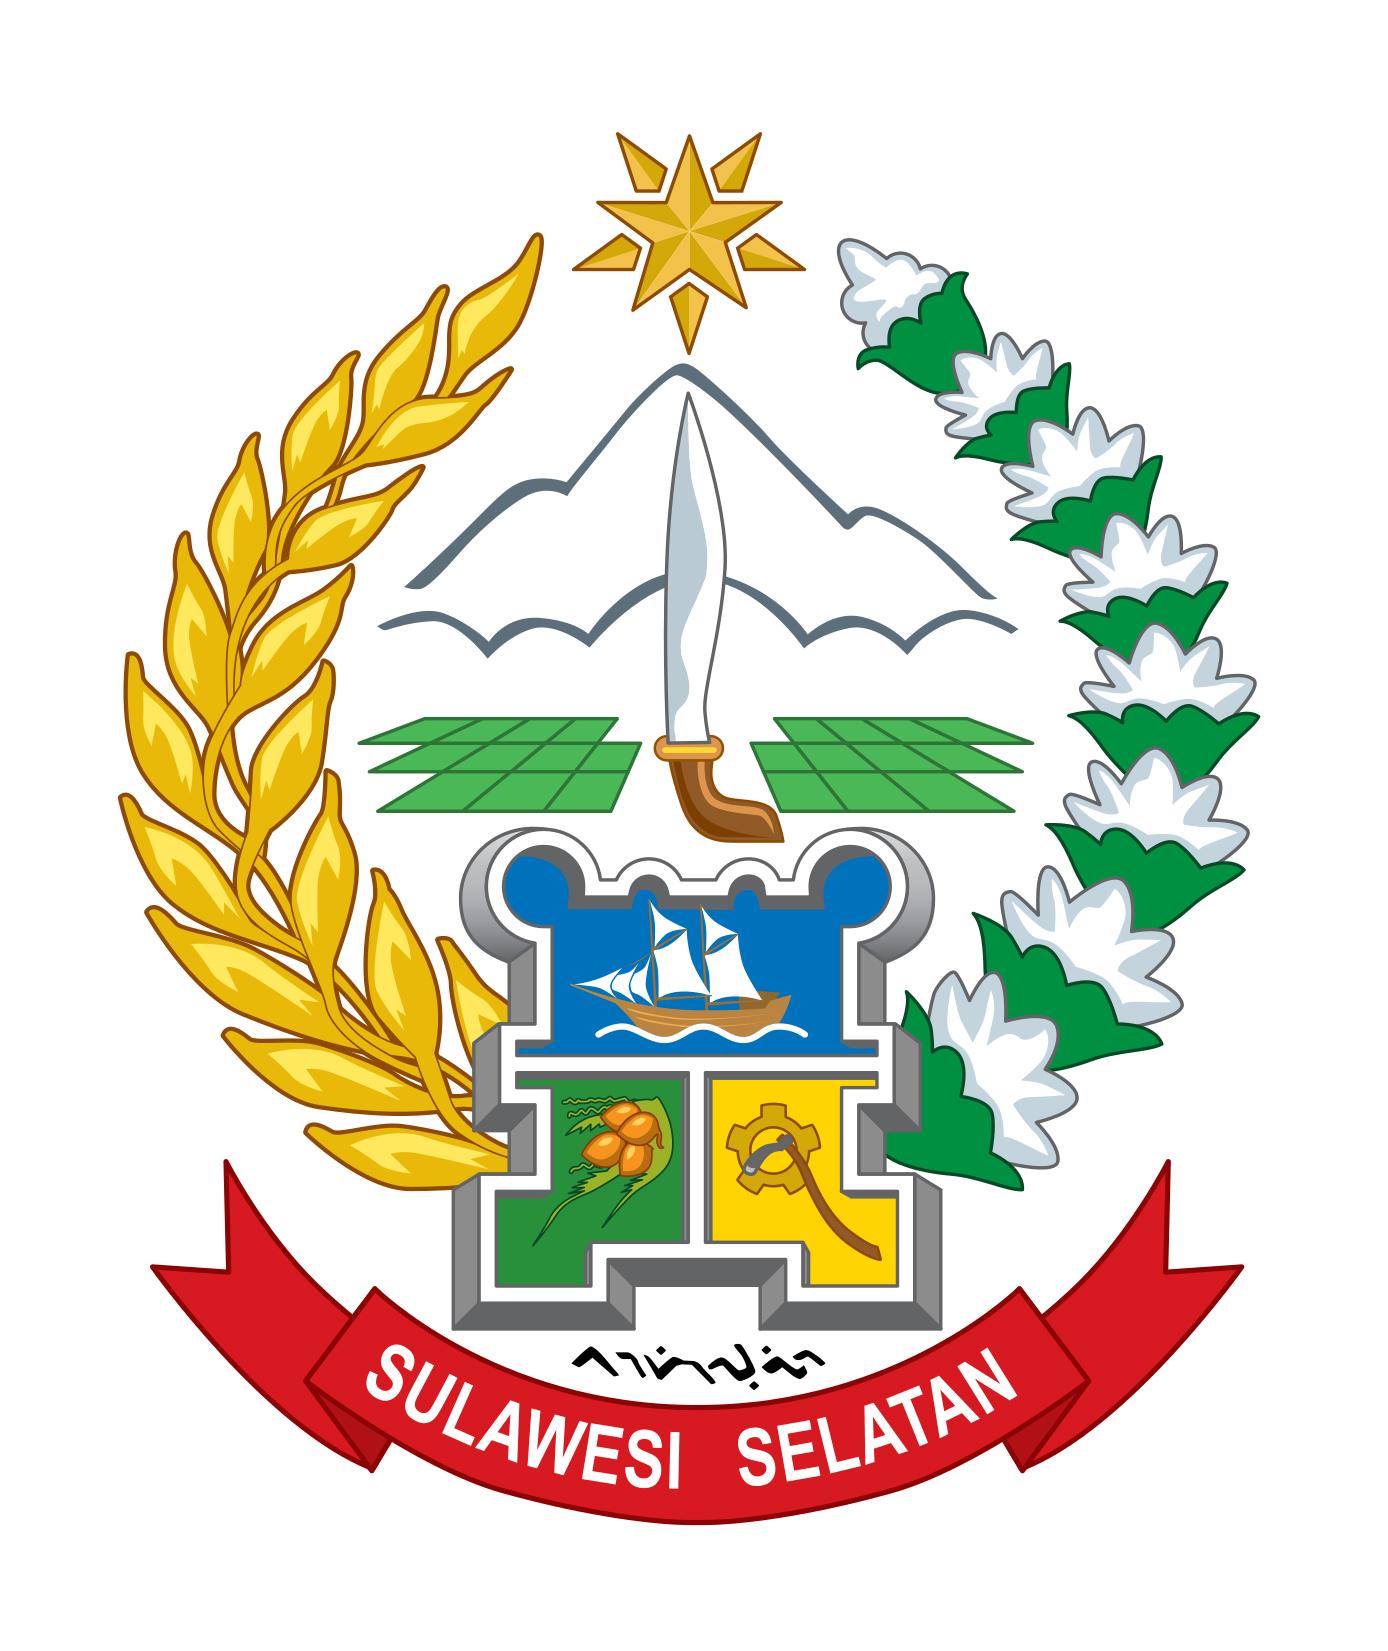 Logo Sulawesi Selatan (Provinsi Sulawesi Selatan) Original